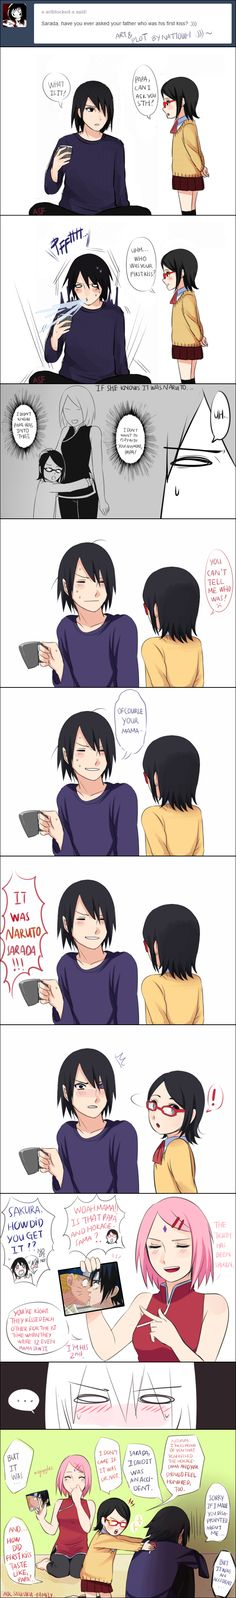 Poor Sasuke.....